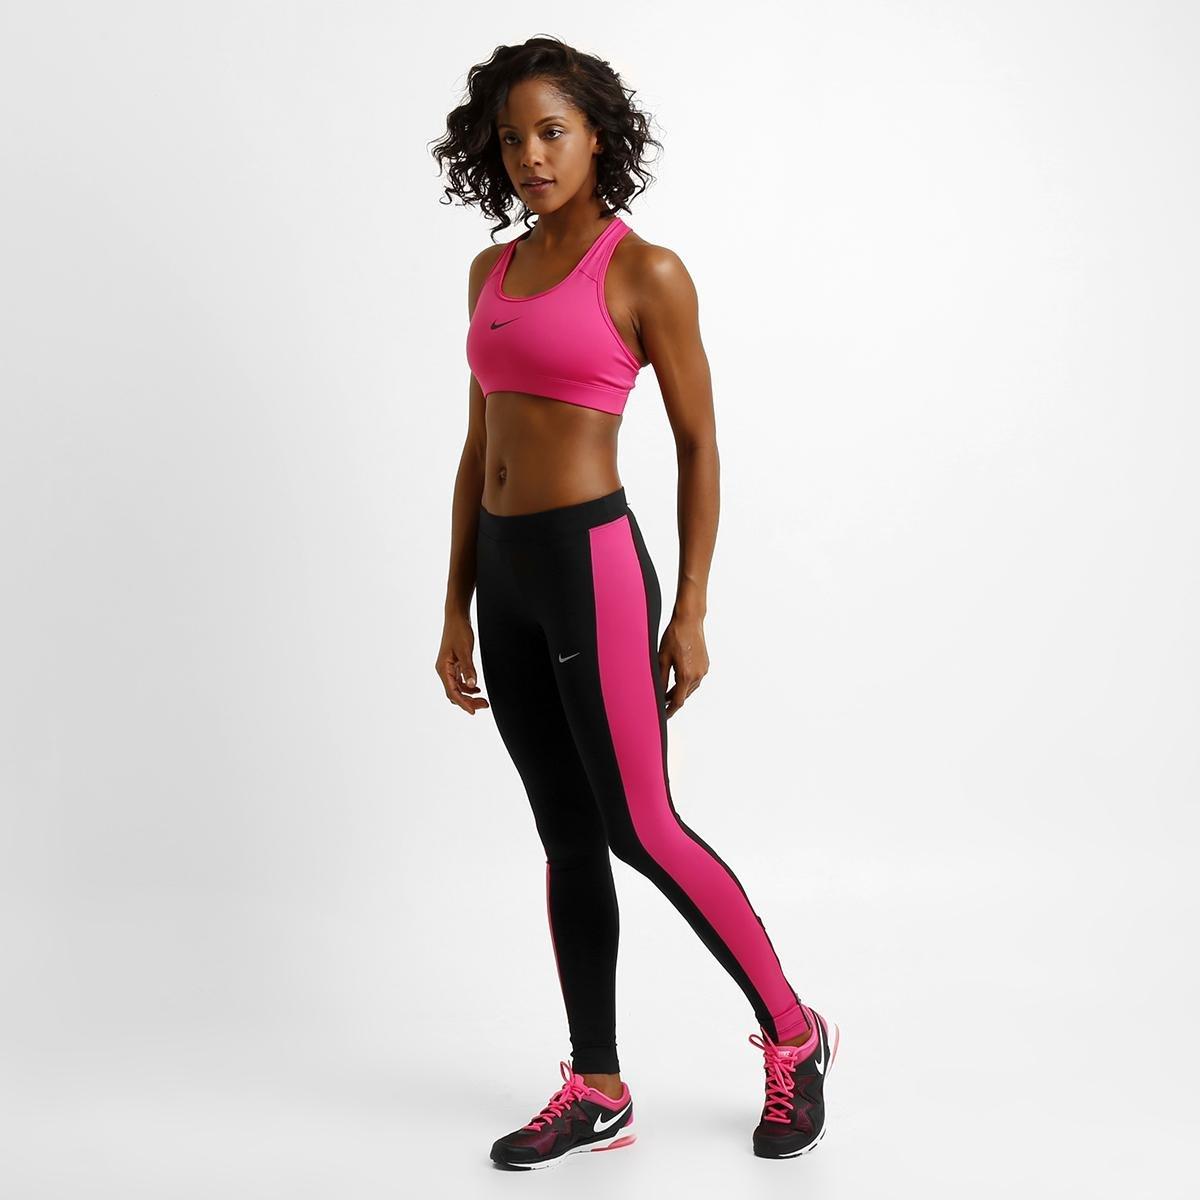 Calça Legging Nike Dri-Fit Pace Tight - Compre Agora  263ed20e22415